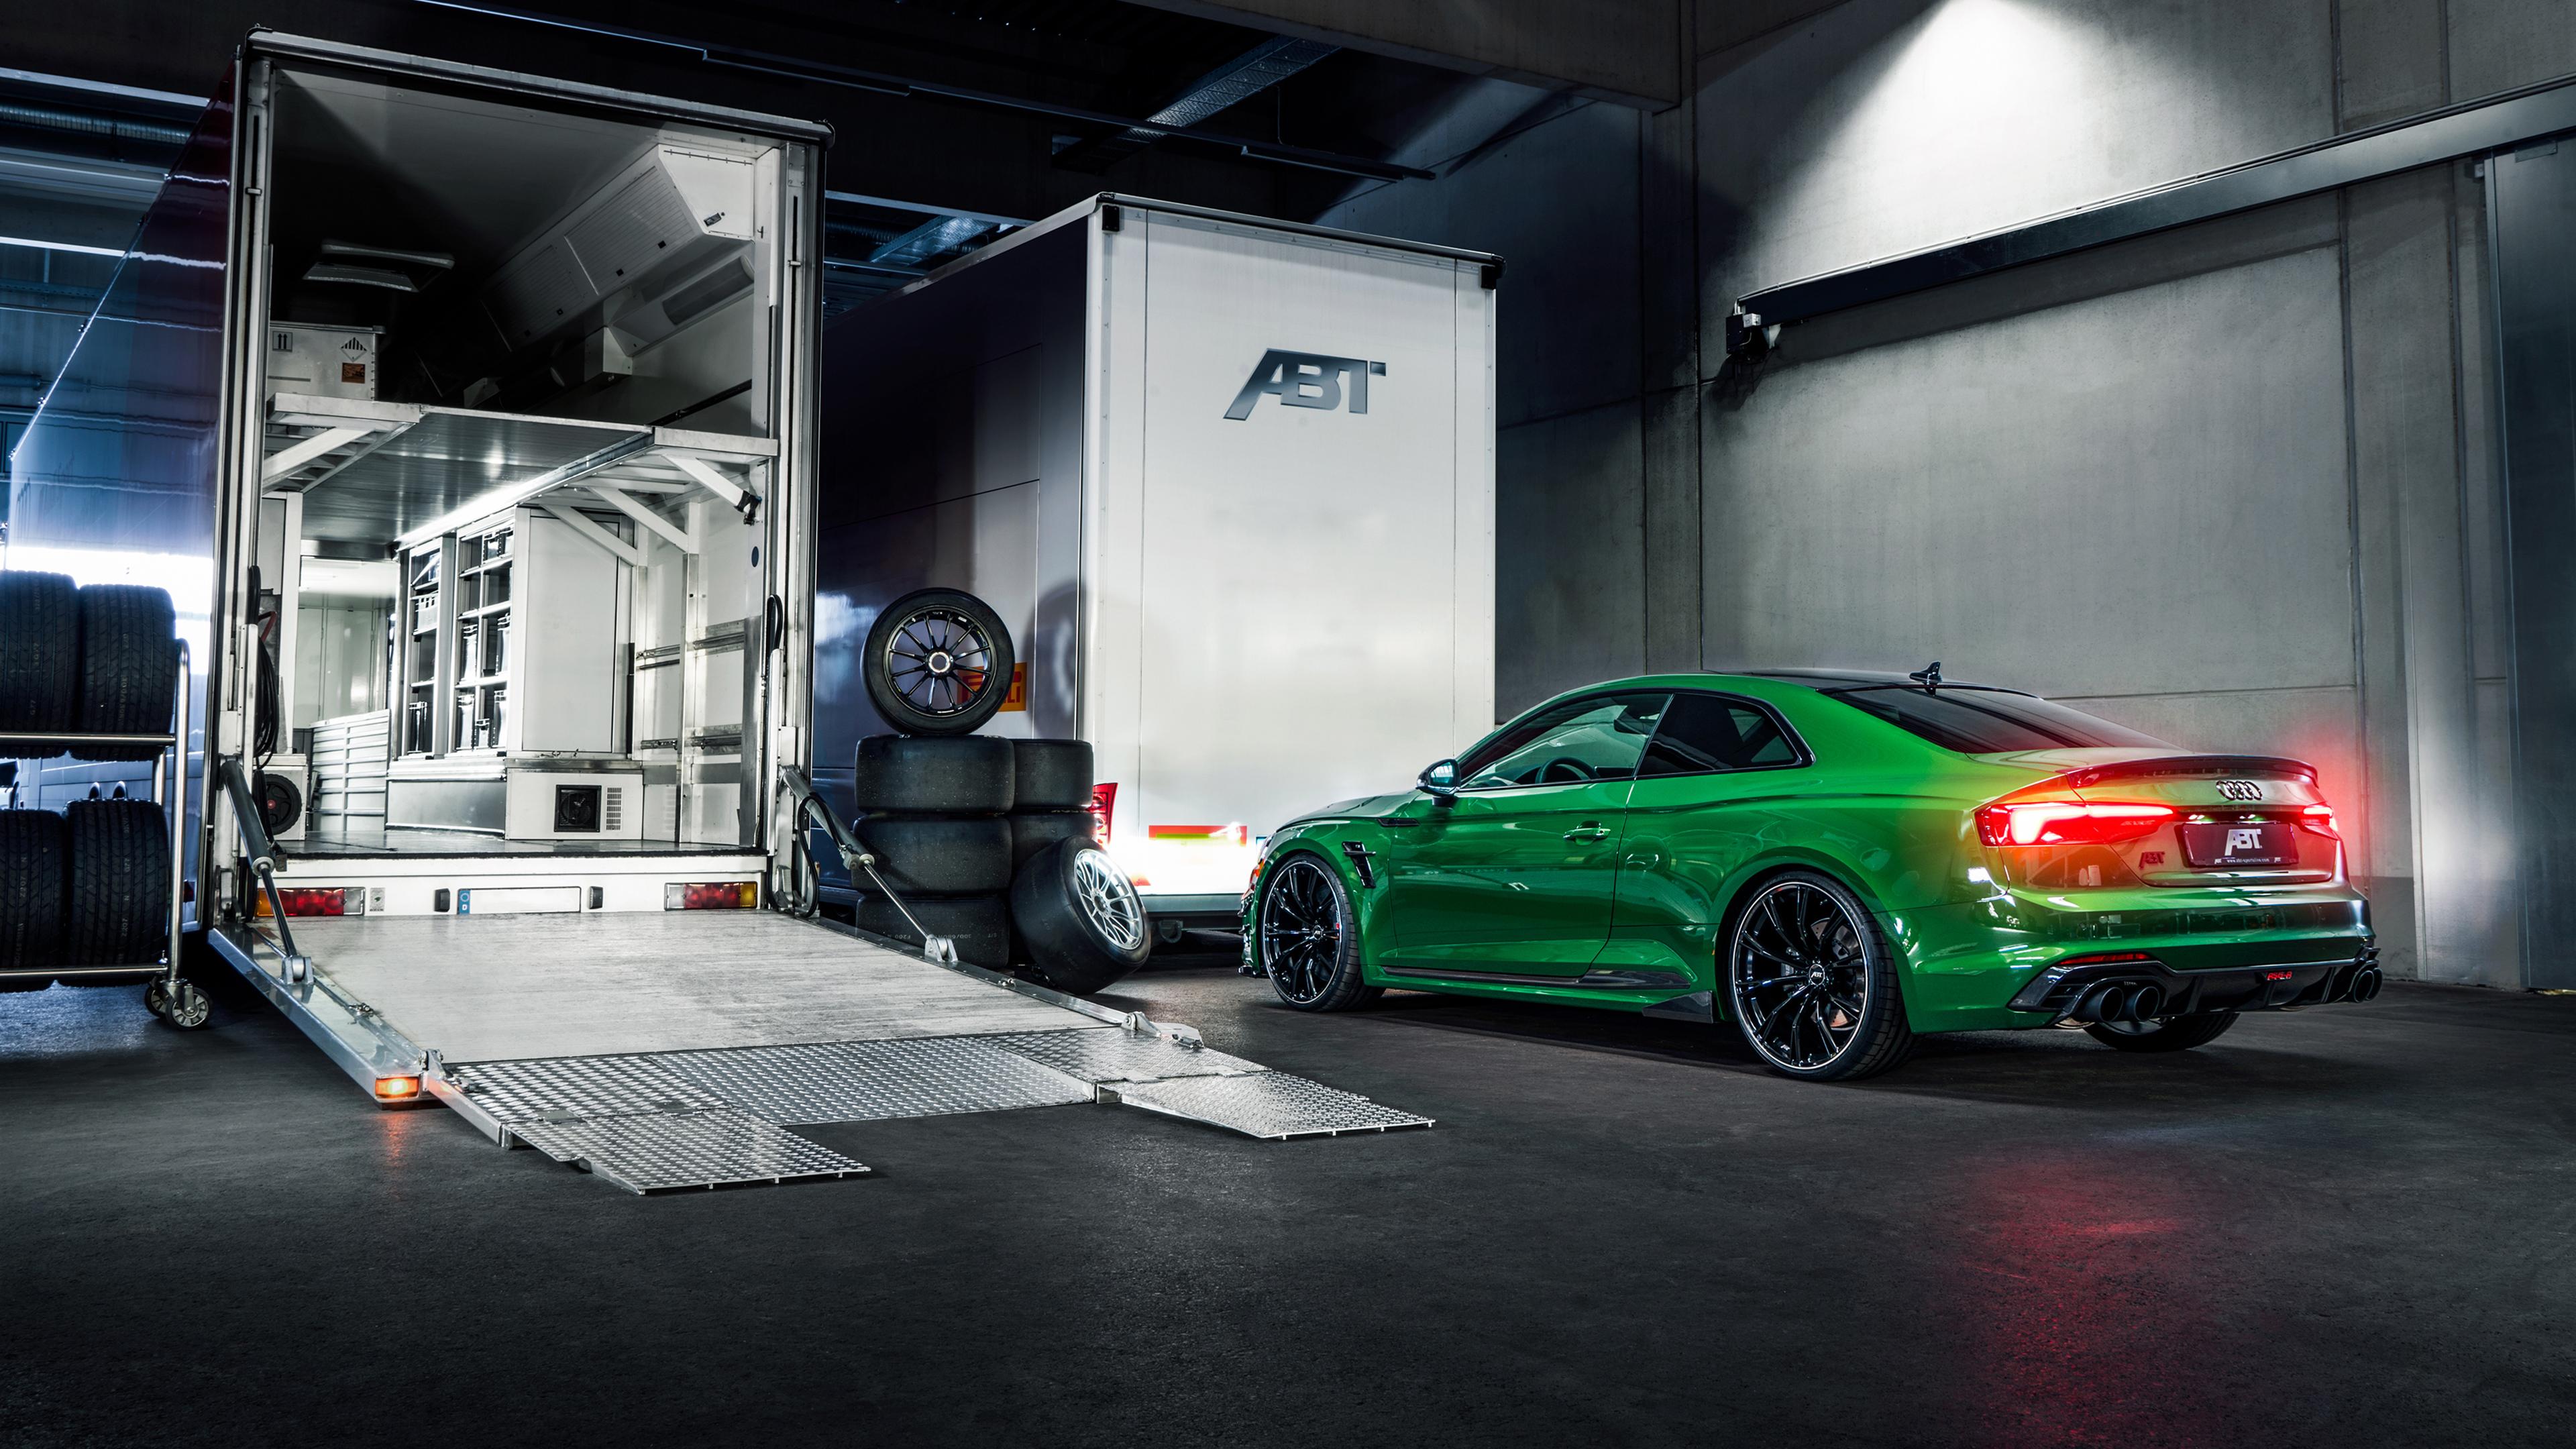 Audi Rs5 Sportback 4k 2019 Wallpapers: 2018 ABT Audi RS5 R Coupe Rear 4K Wallpaper